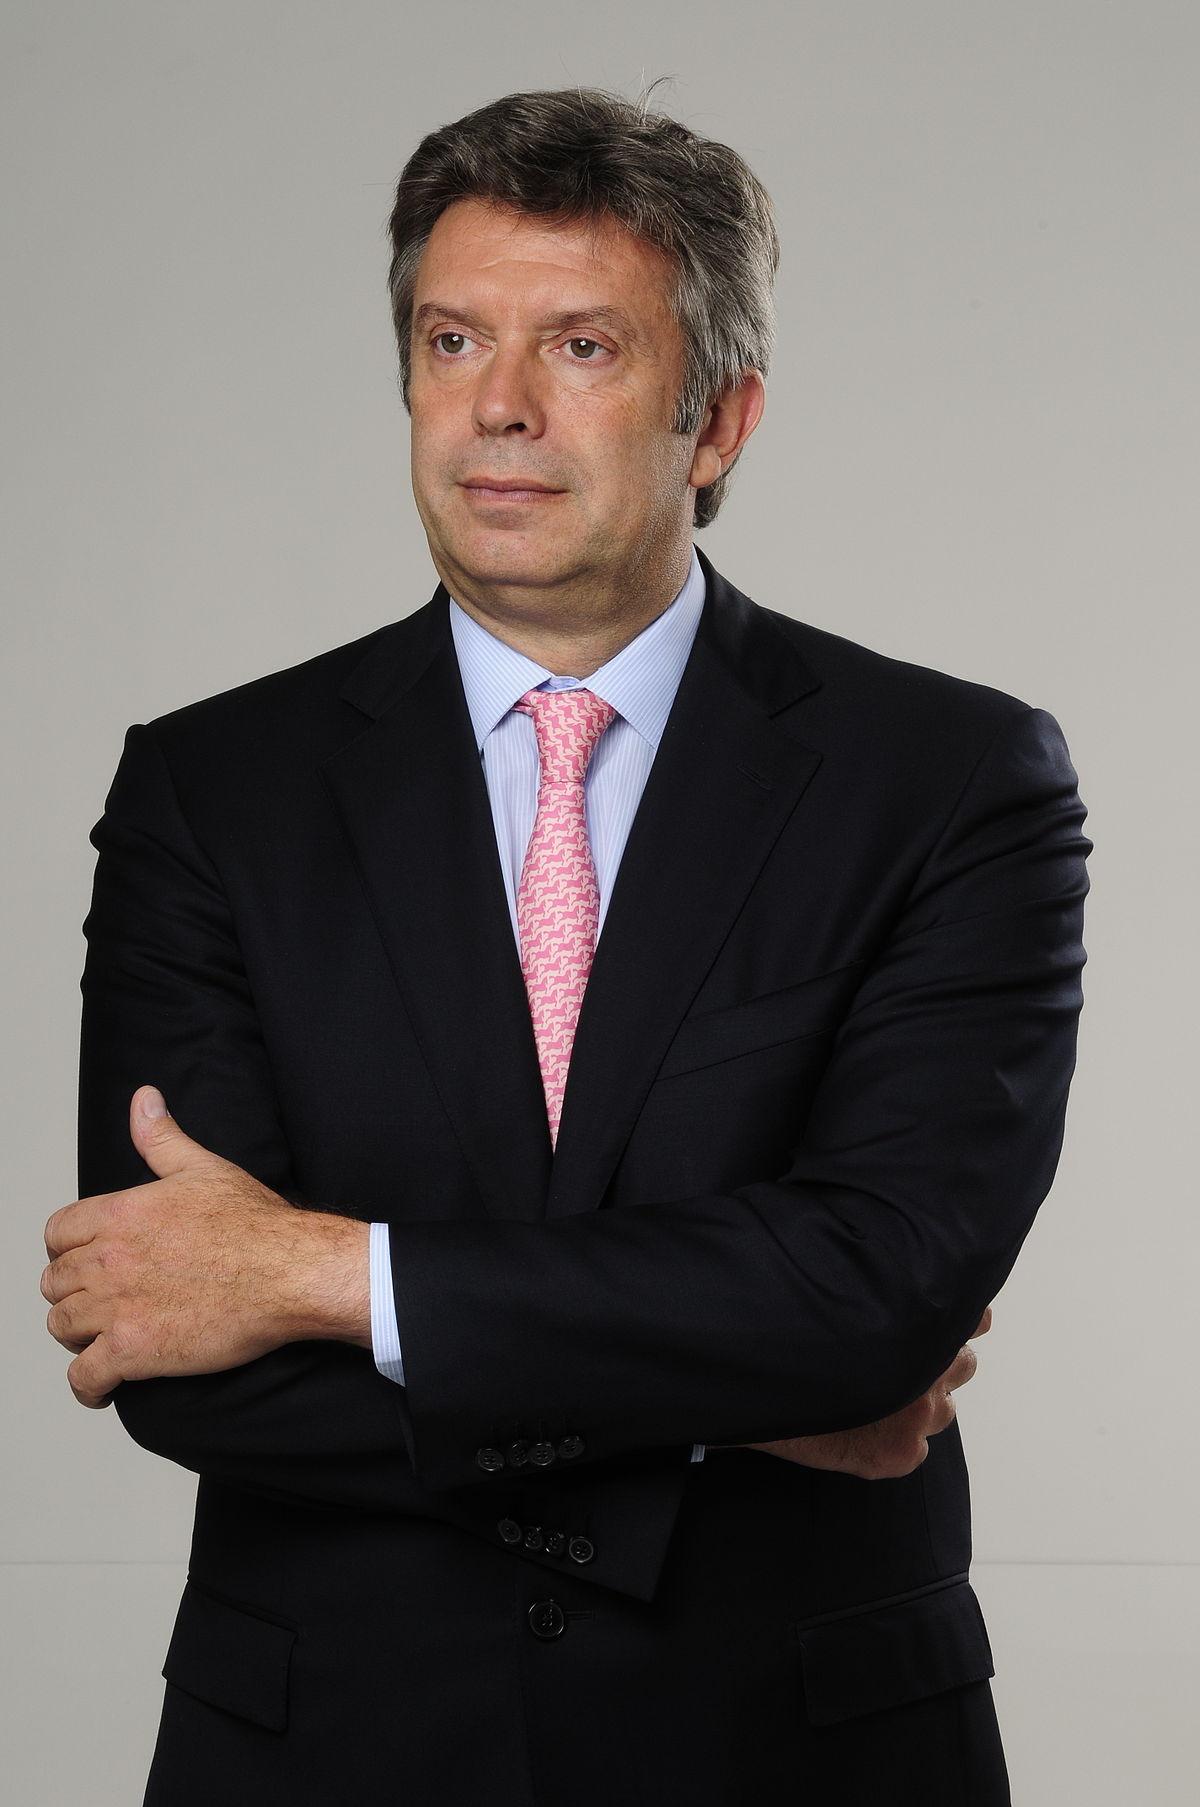 Mauricio d 39 alessandro wikipedia la enciclopedia libre for Noticias dela farandula argentina